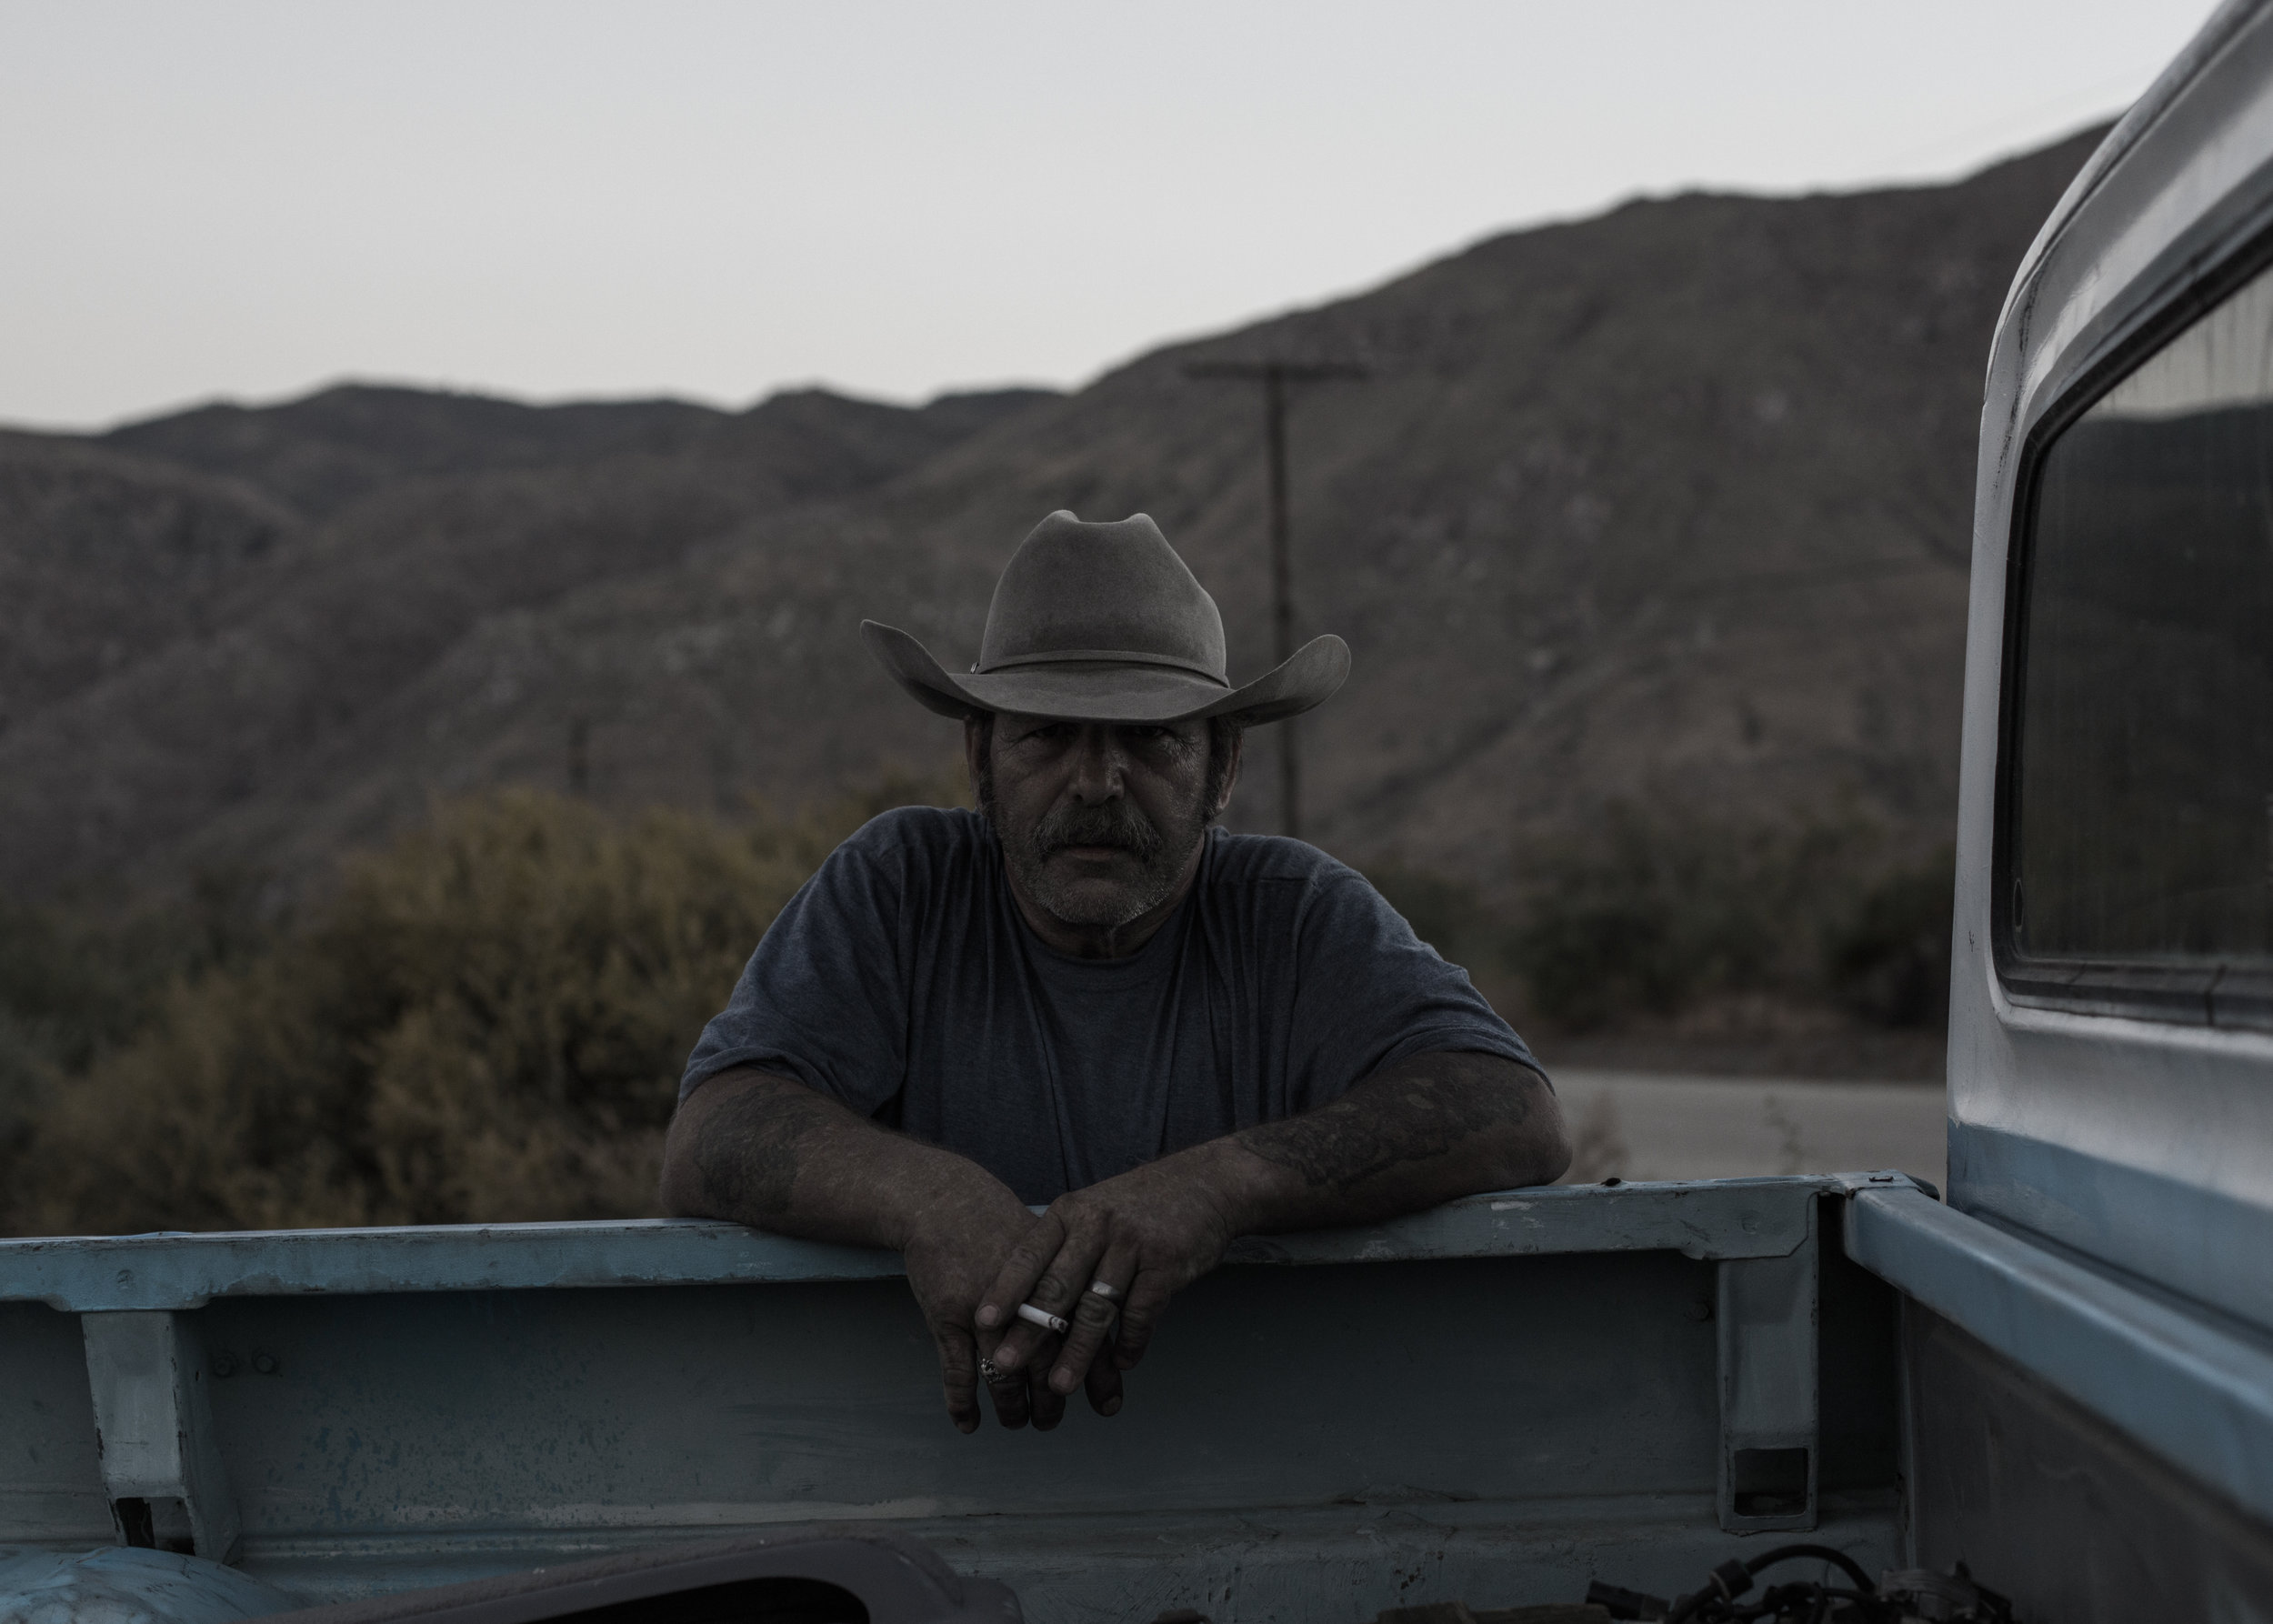 5_Dwayne with Truck.jpg